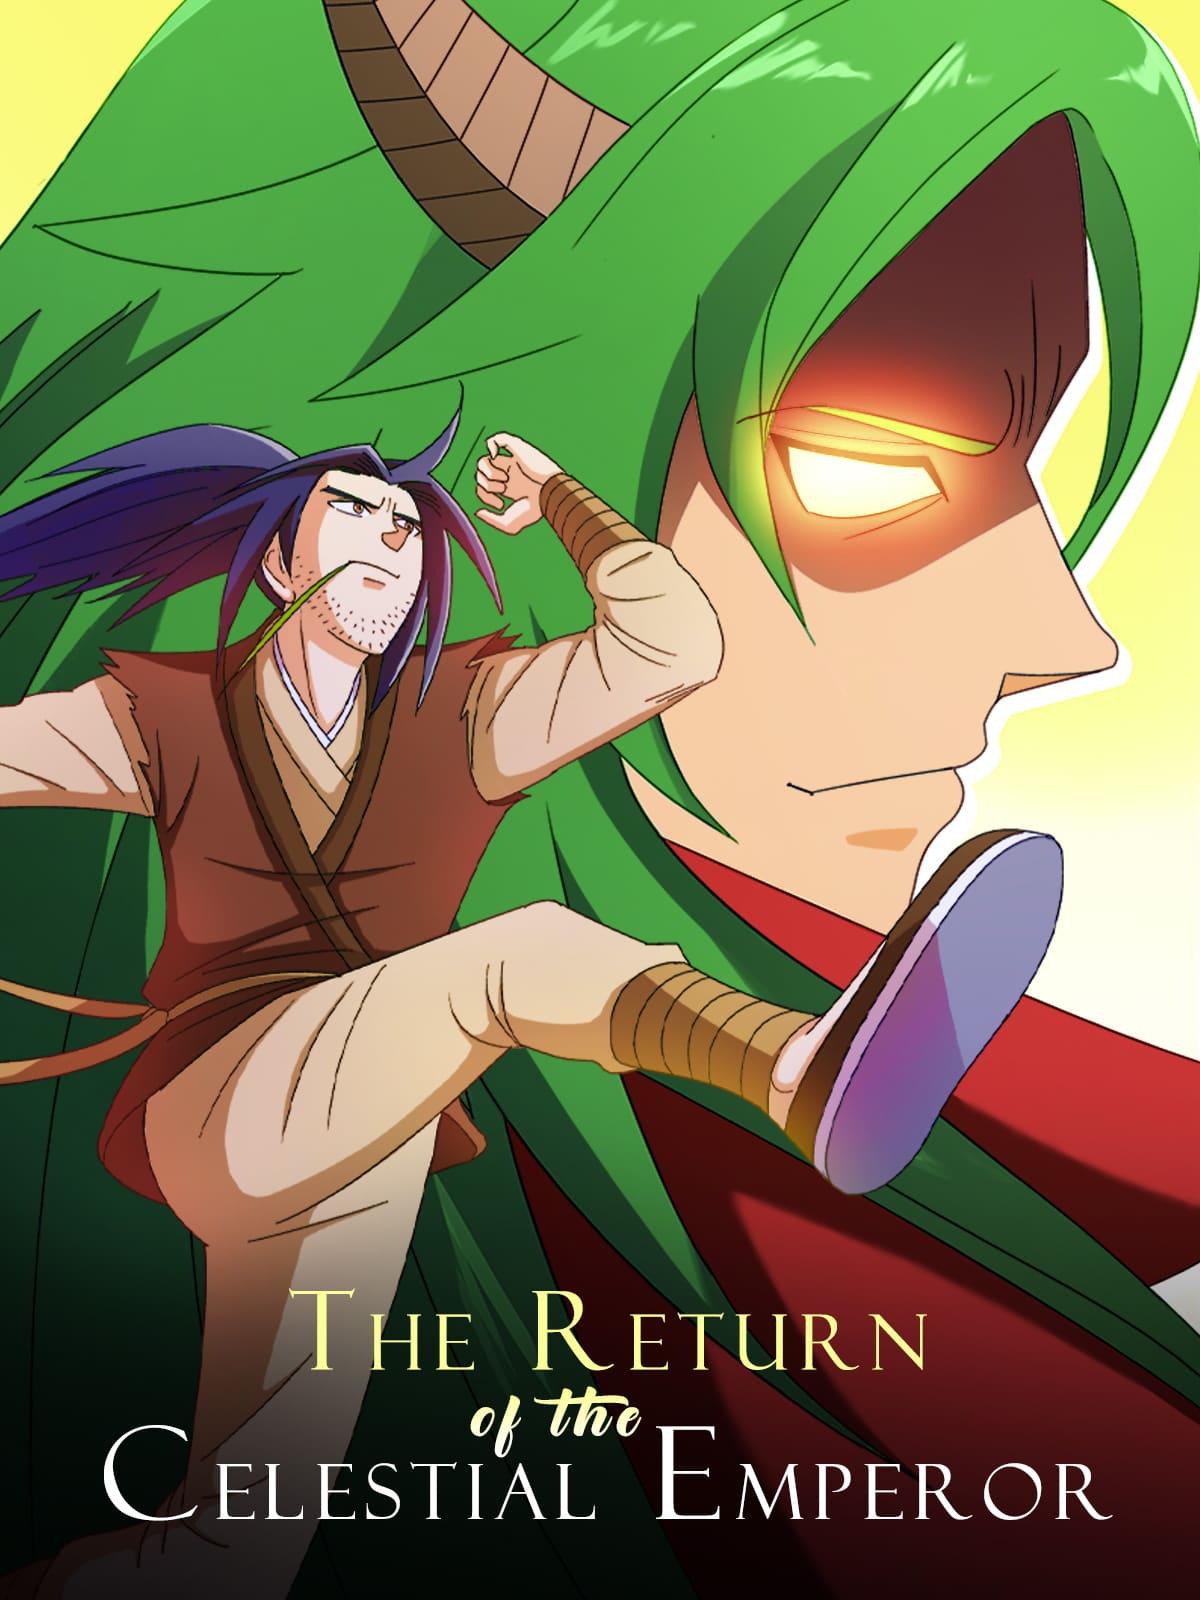 The Return of the Celestial Emperor